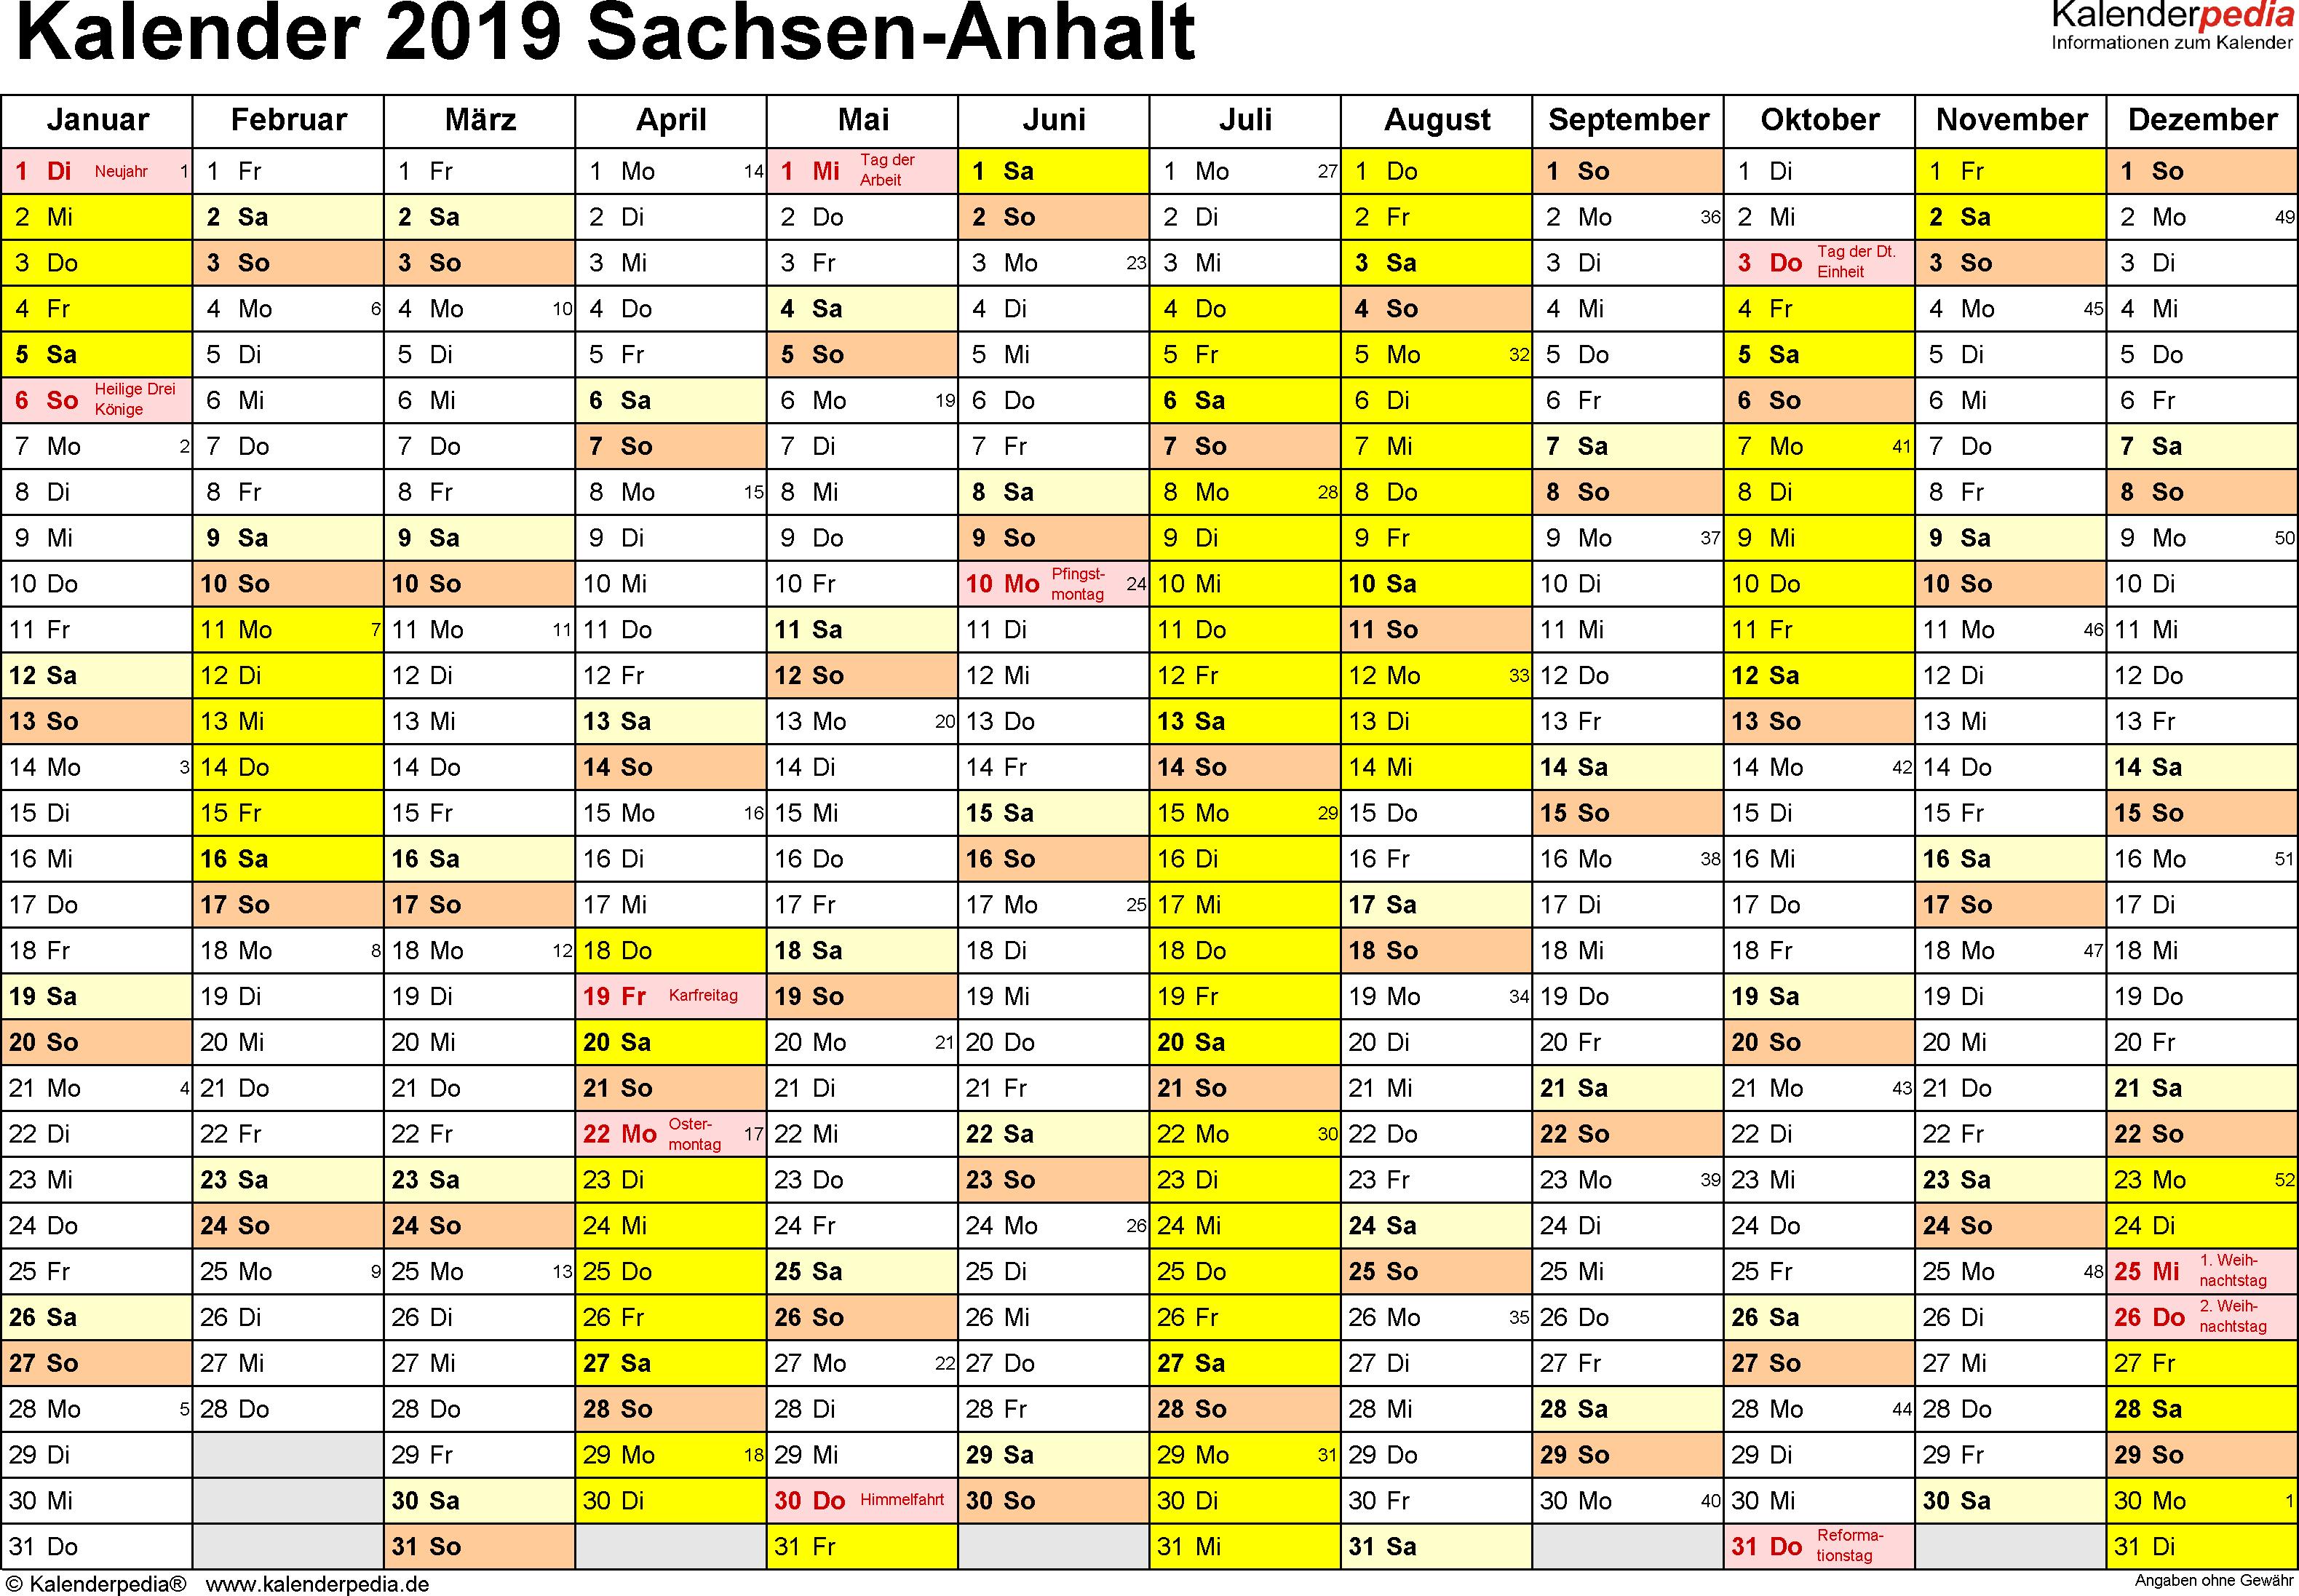 Kalender 2019 Sachsen-Anhalt